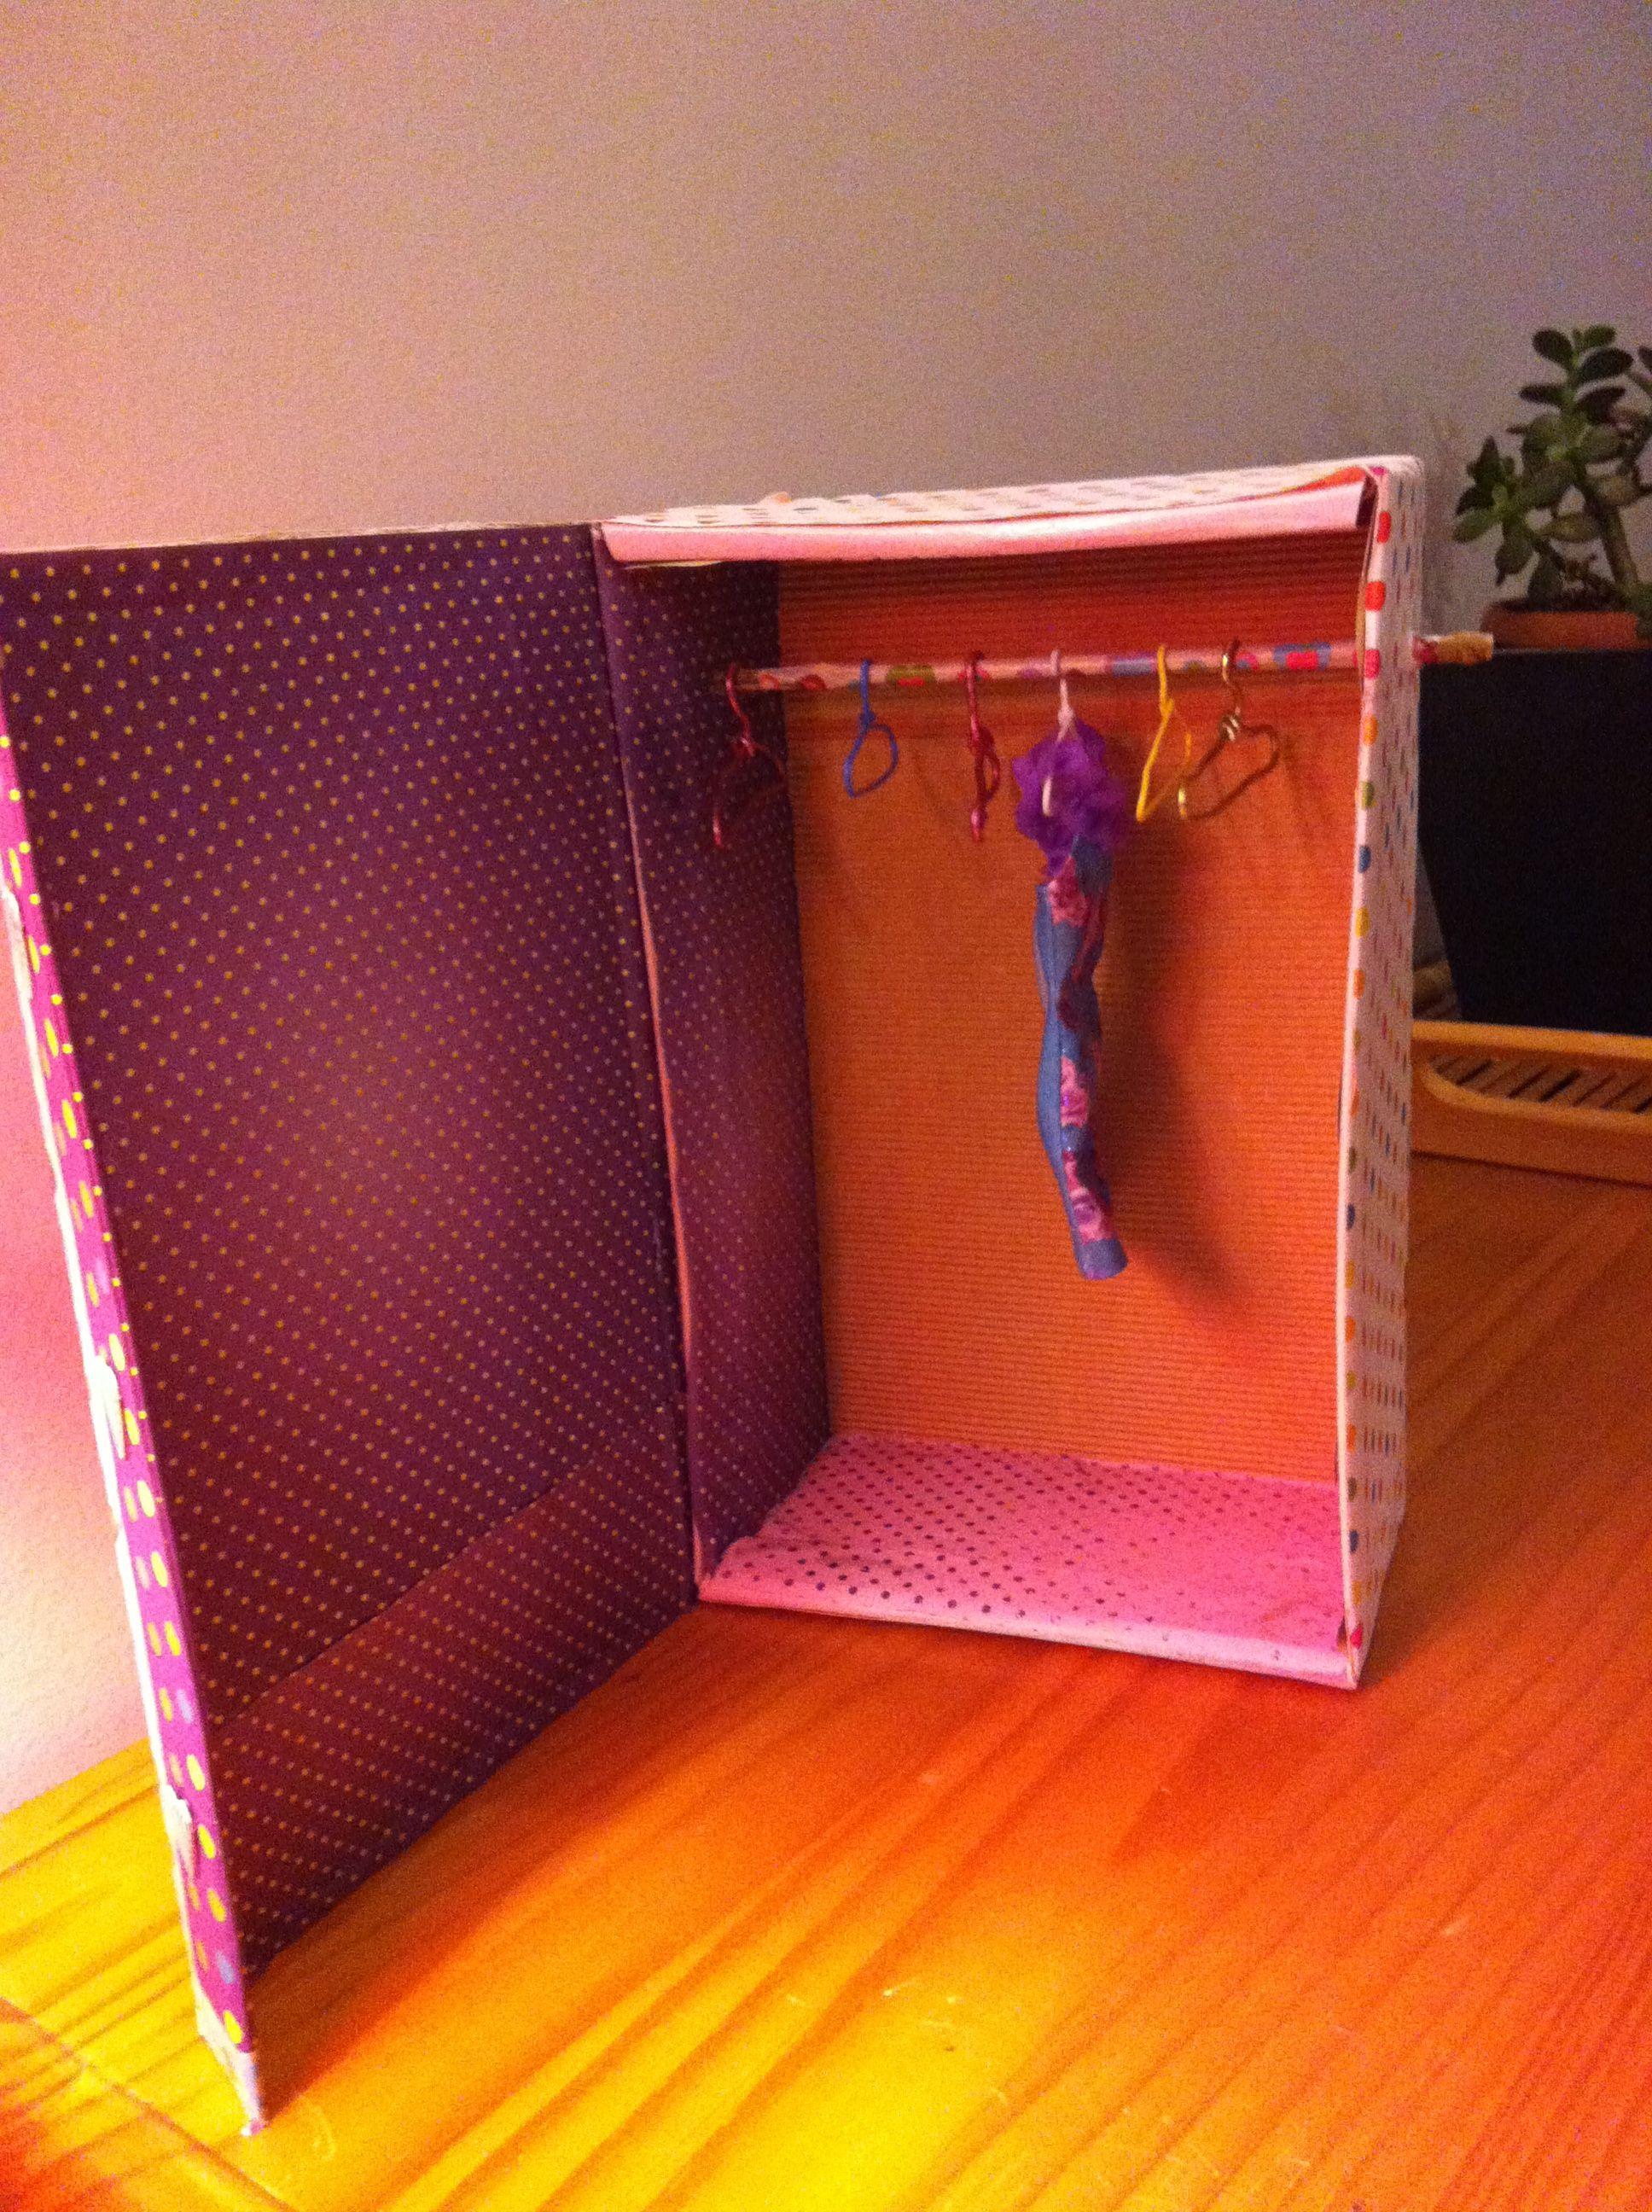 Recyclage Boite Chaussures En Placard Barbie Mes Cras